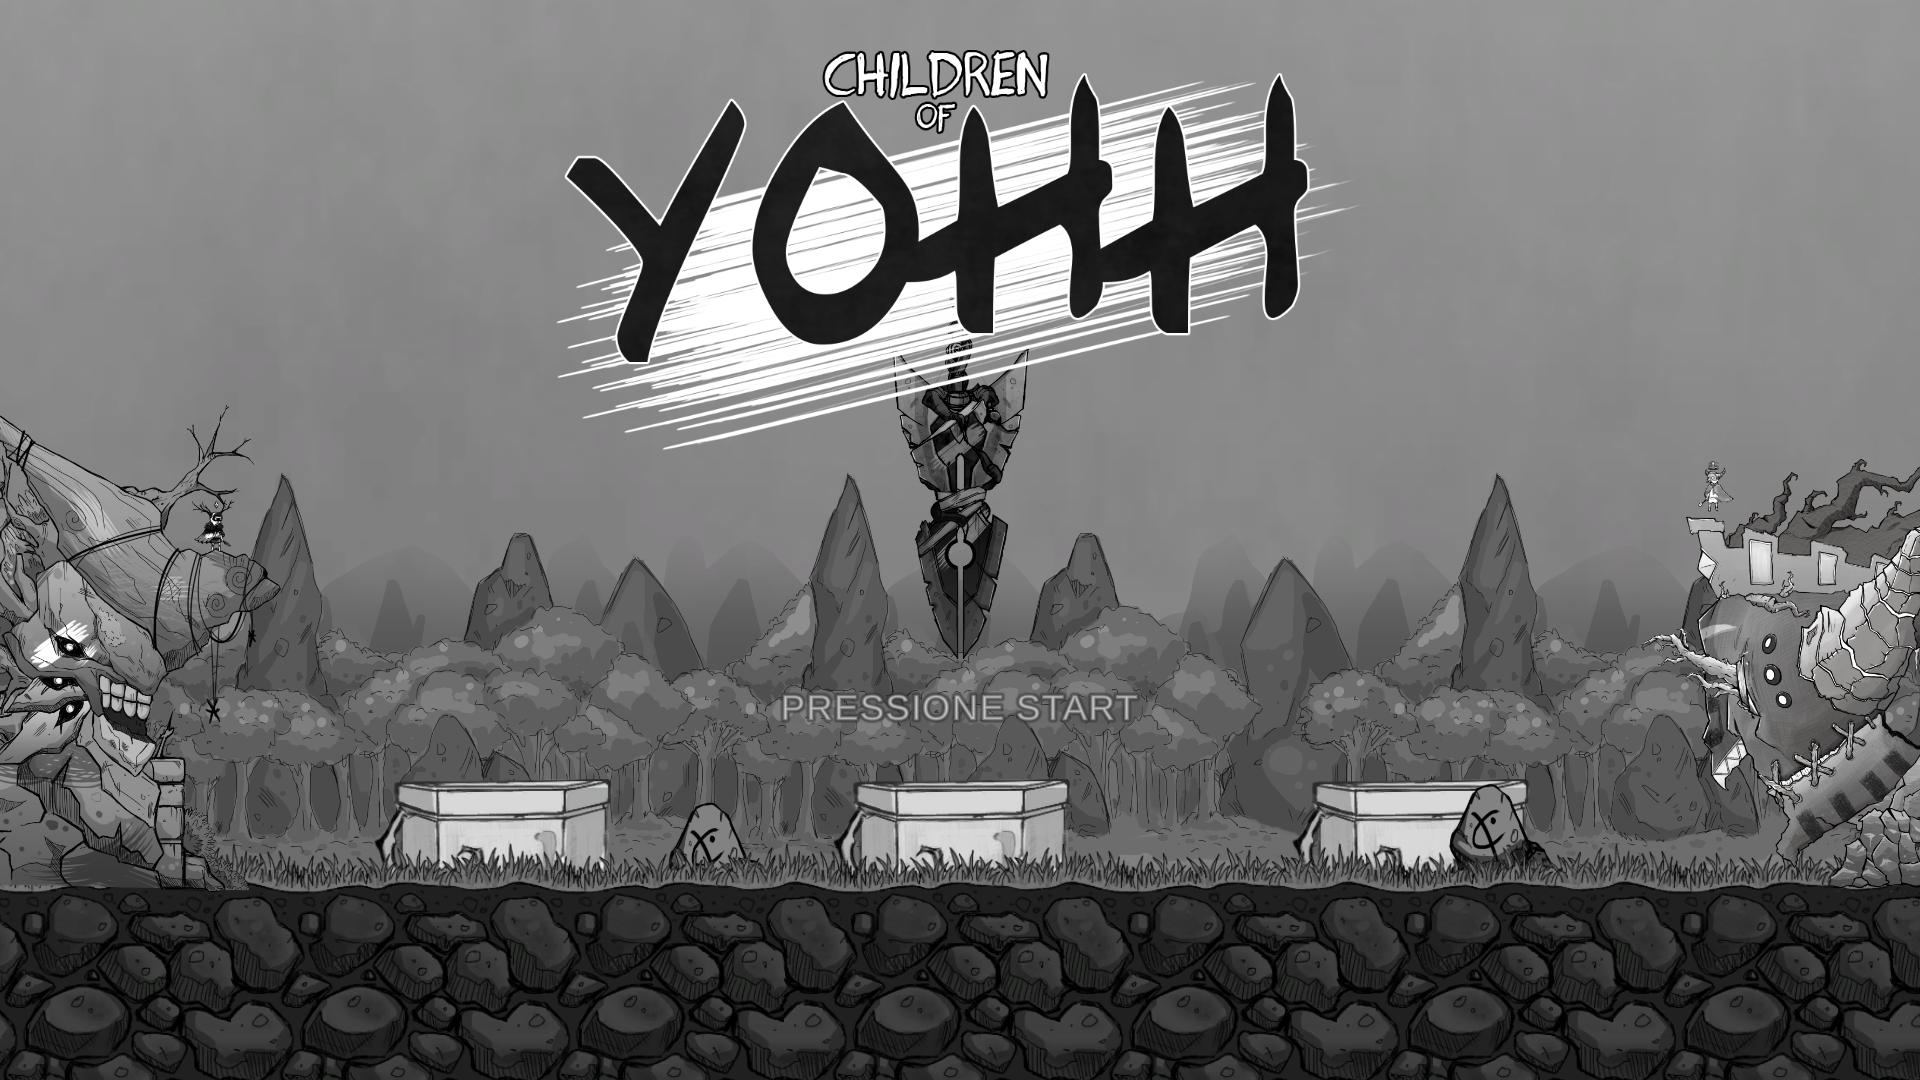 Children of Yohh Classic